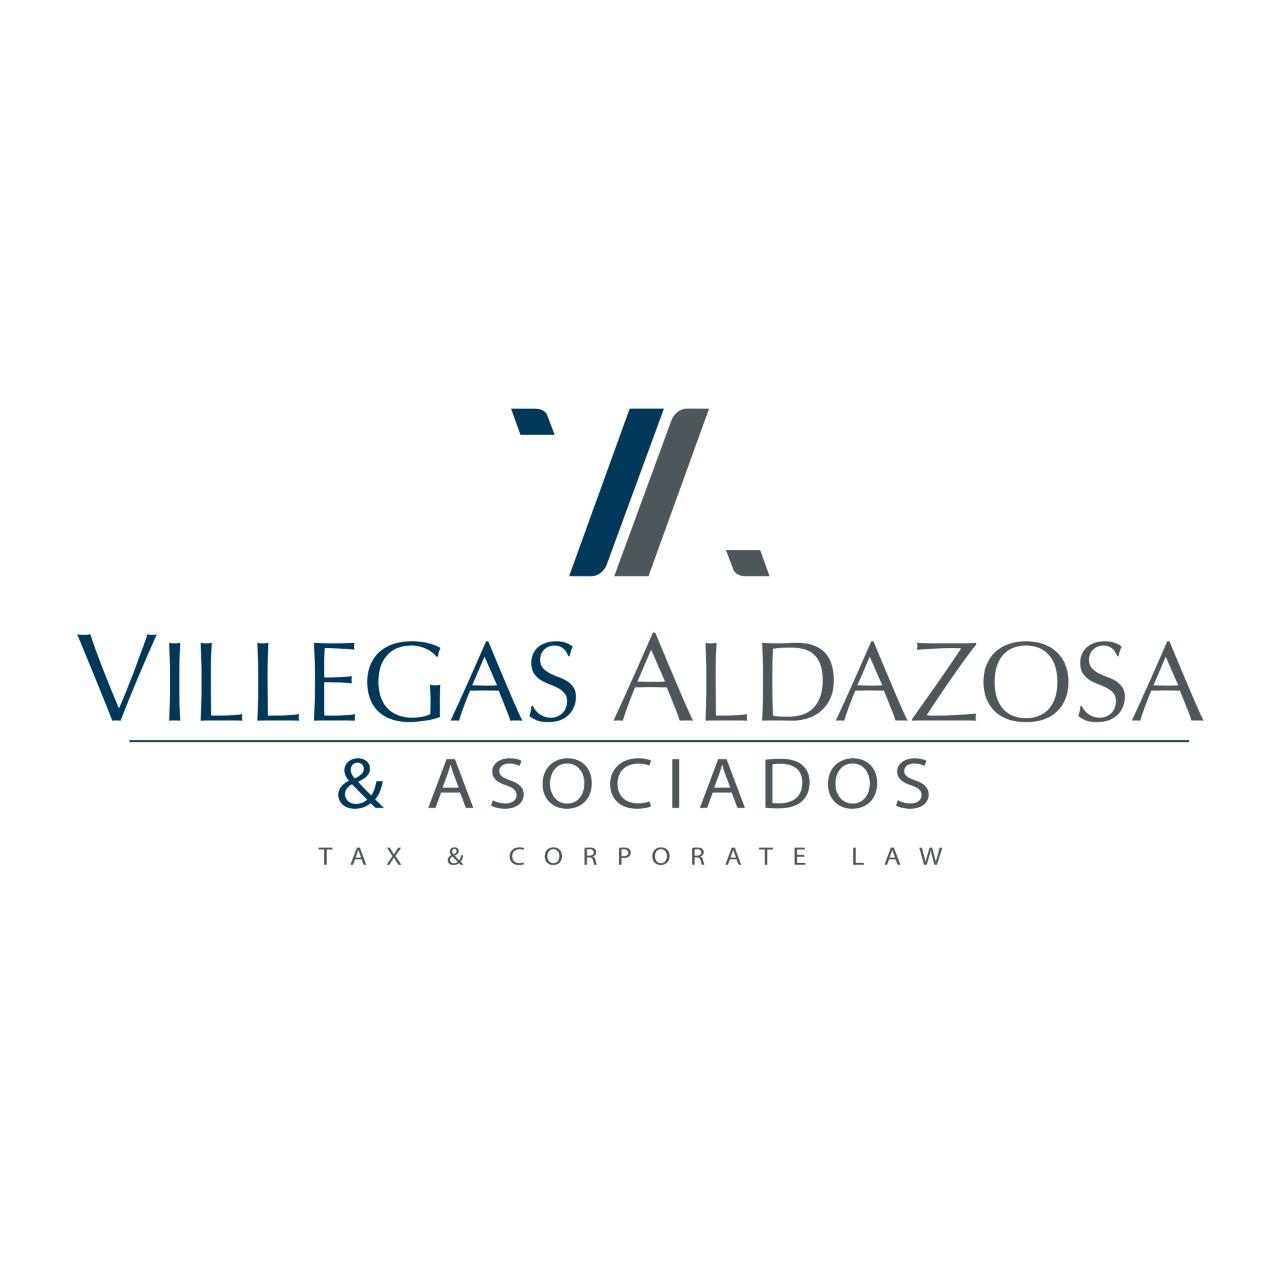 the Villegas Aldazosa & Asociados Soc. Civ. logo.